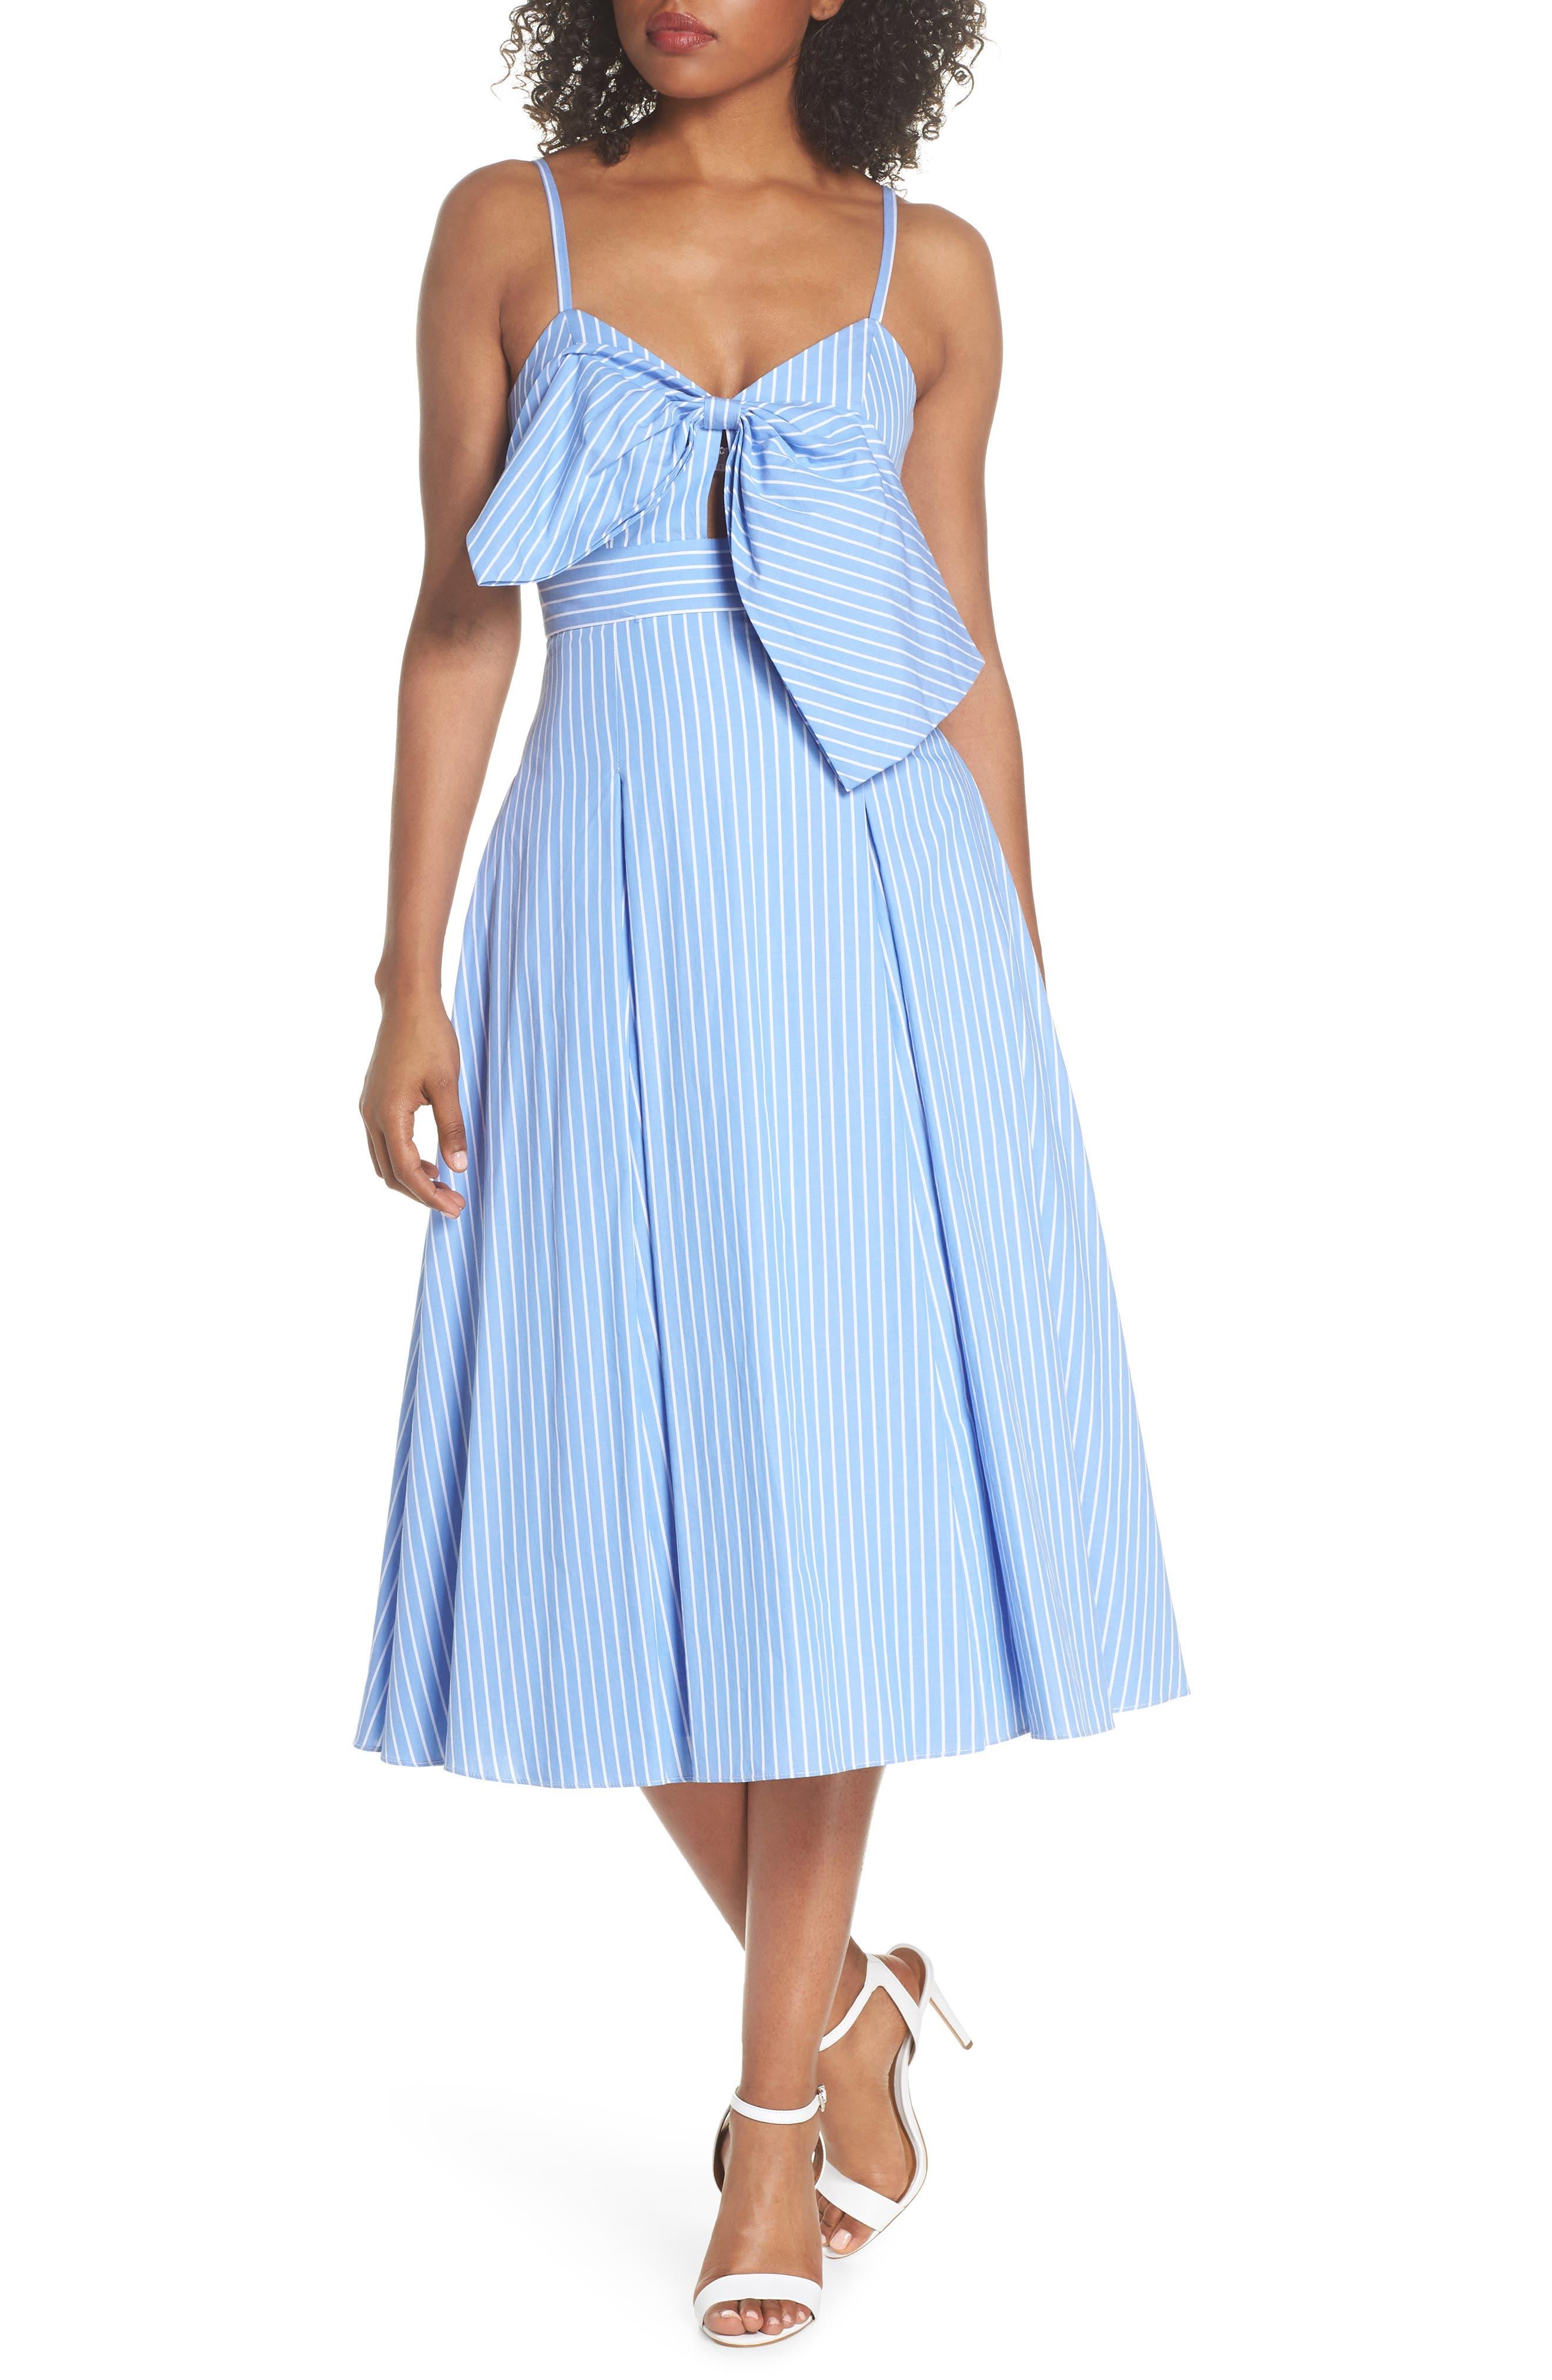 Becky Bow Front Tea Length Dress,                         Main,                         color, Pale Blue/ White Stripe